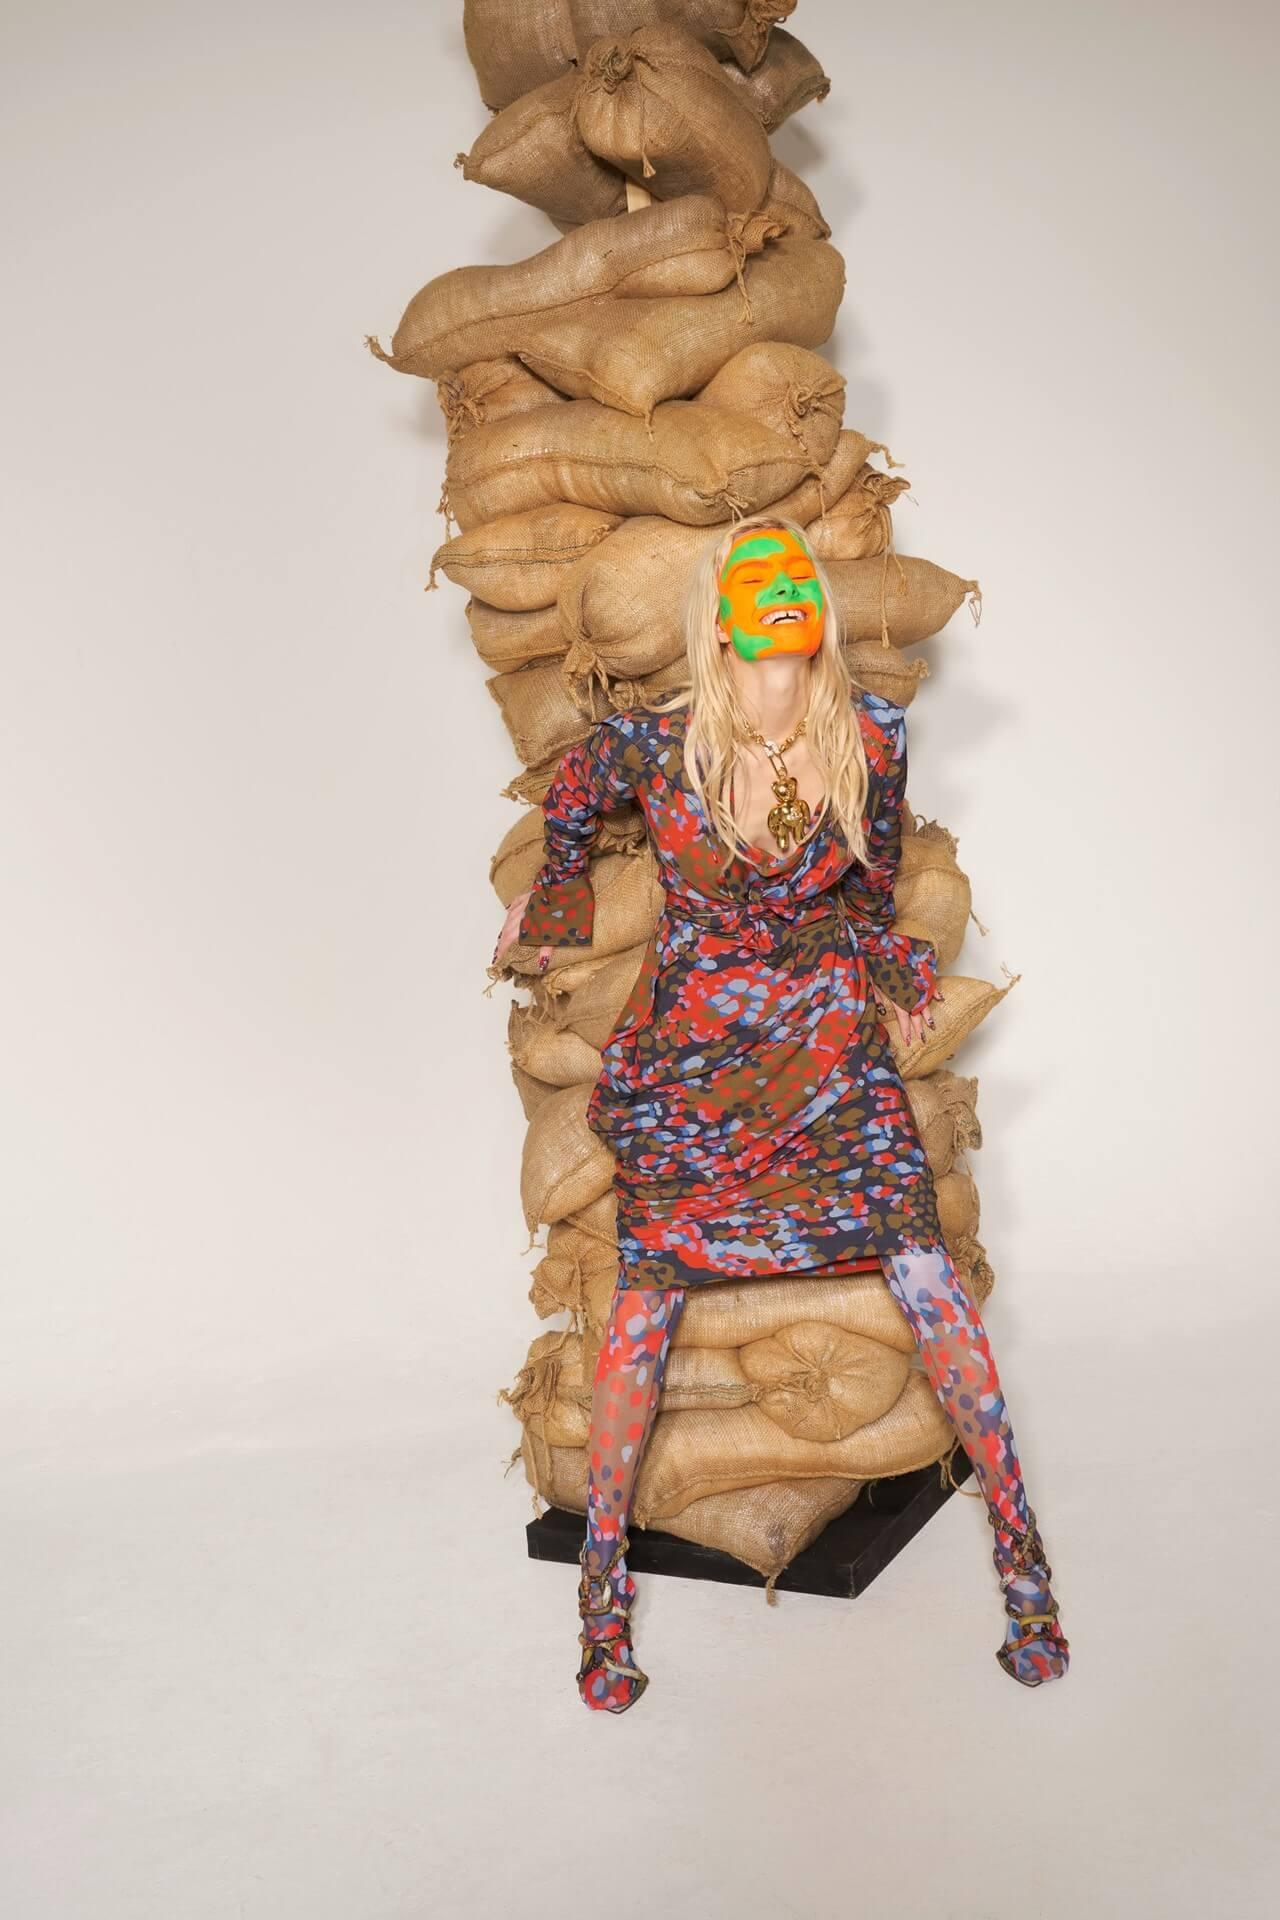 Vivienne Westwood A/W 2018. Fotografía: Maria Ziegelboeck